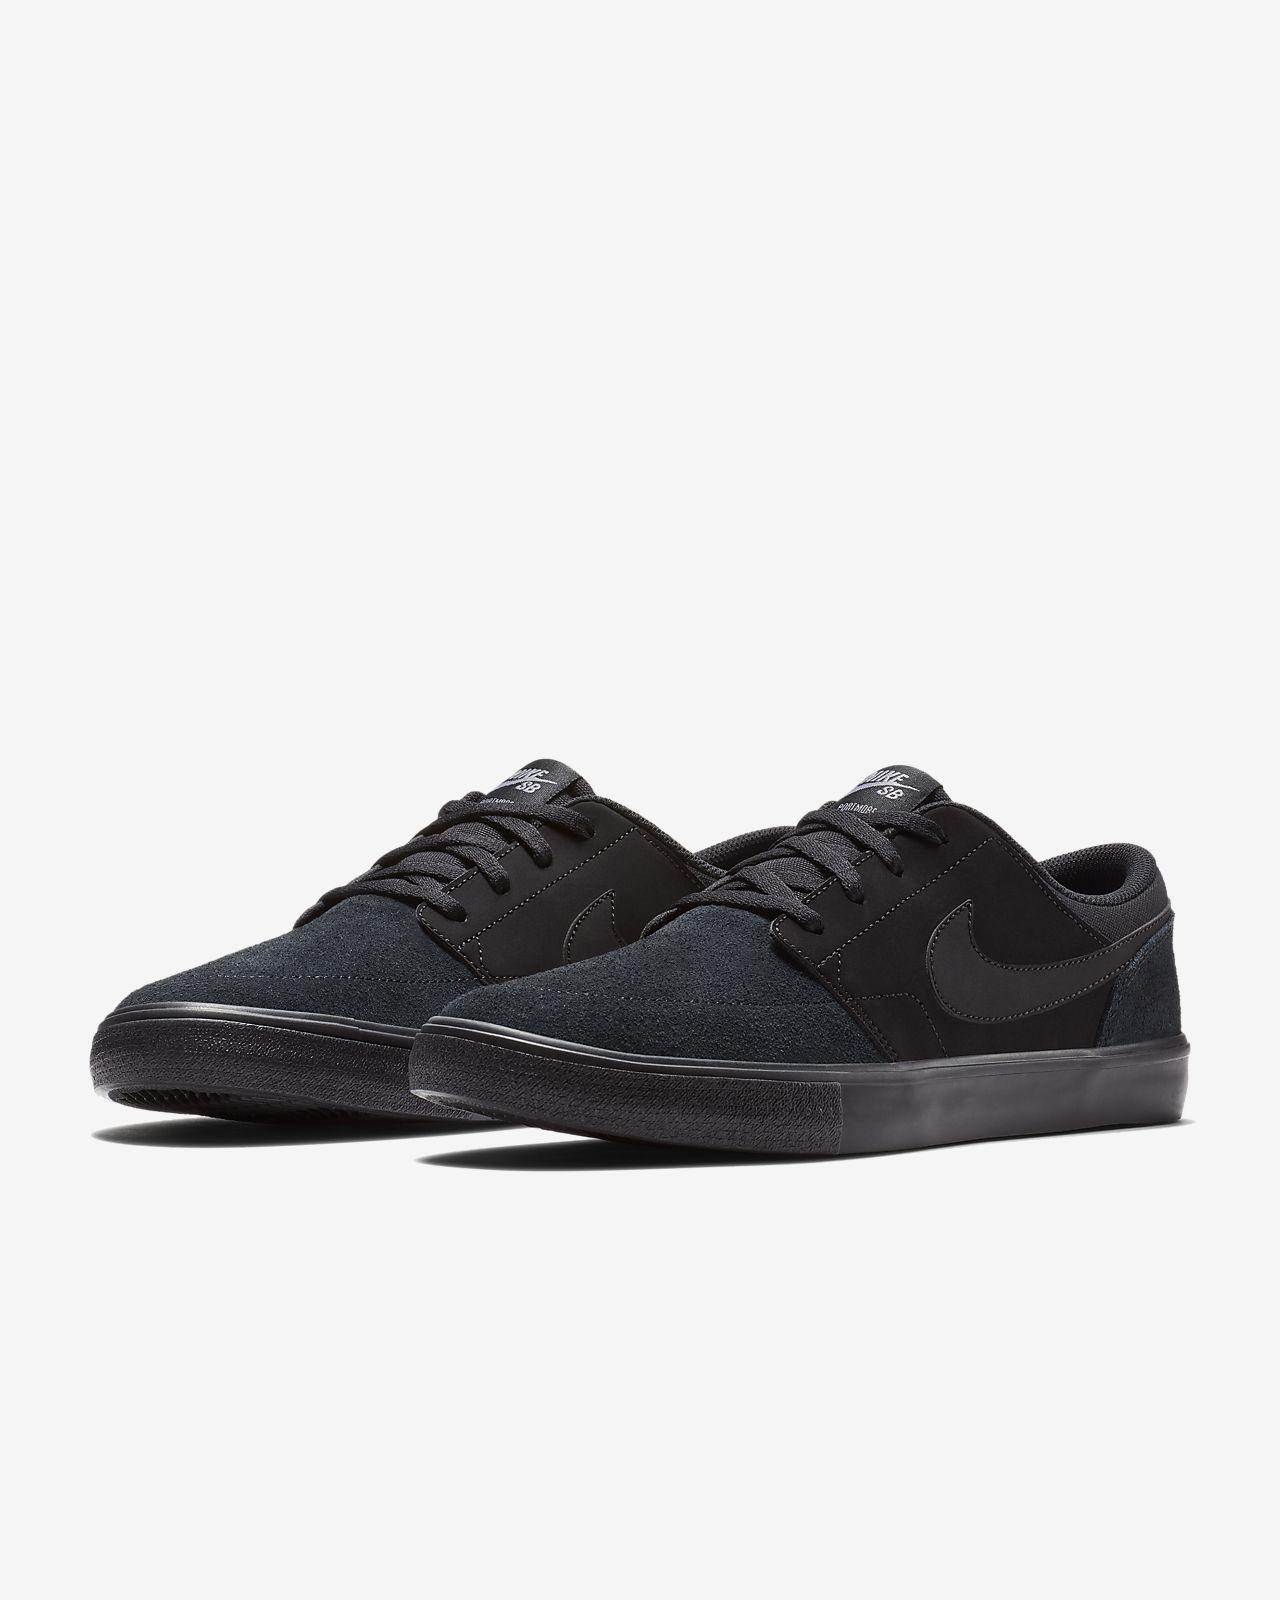 Calzado de skateboarding para hombre Nike SB Solarsoft Portmore II Mid